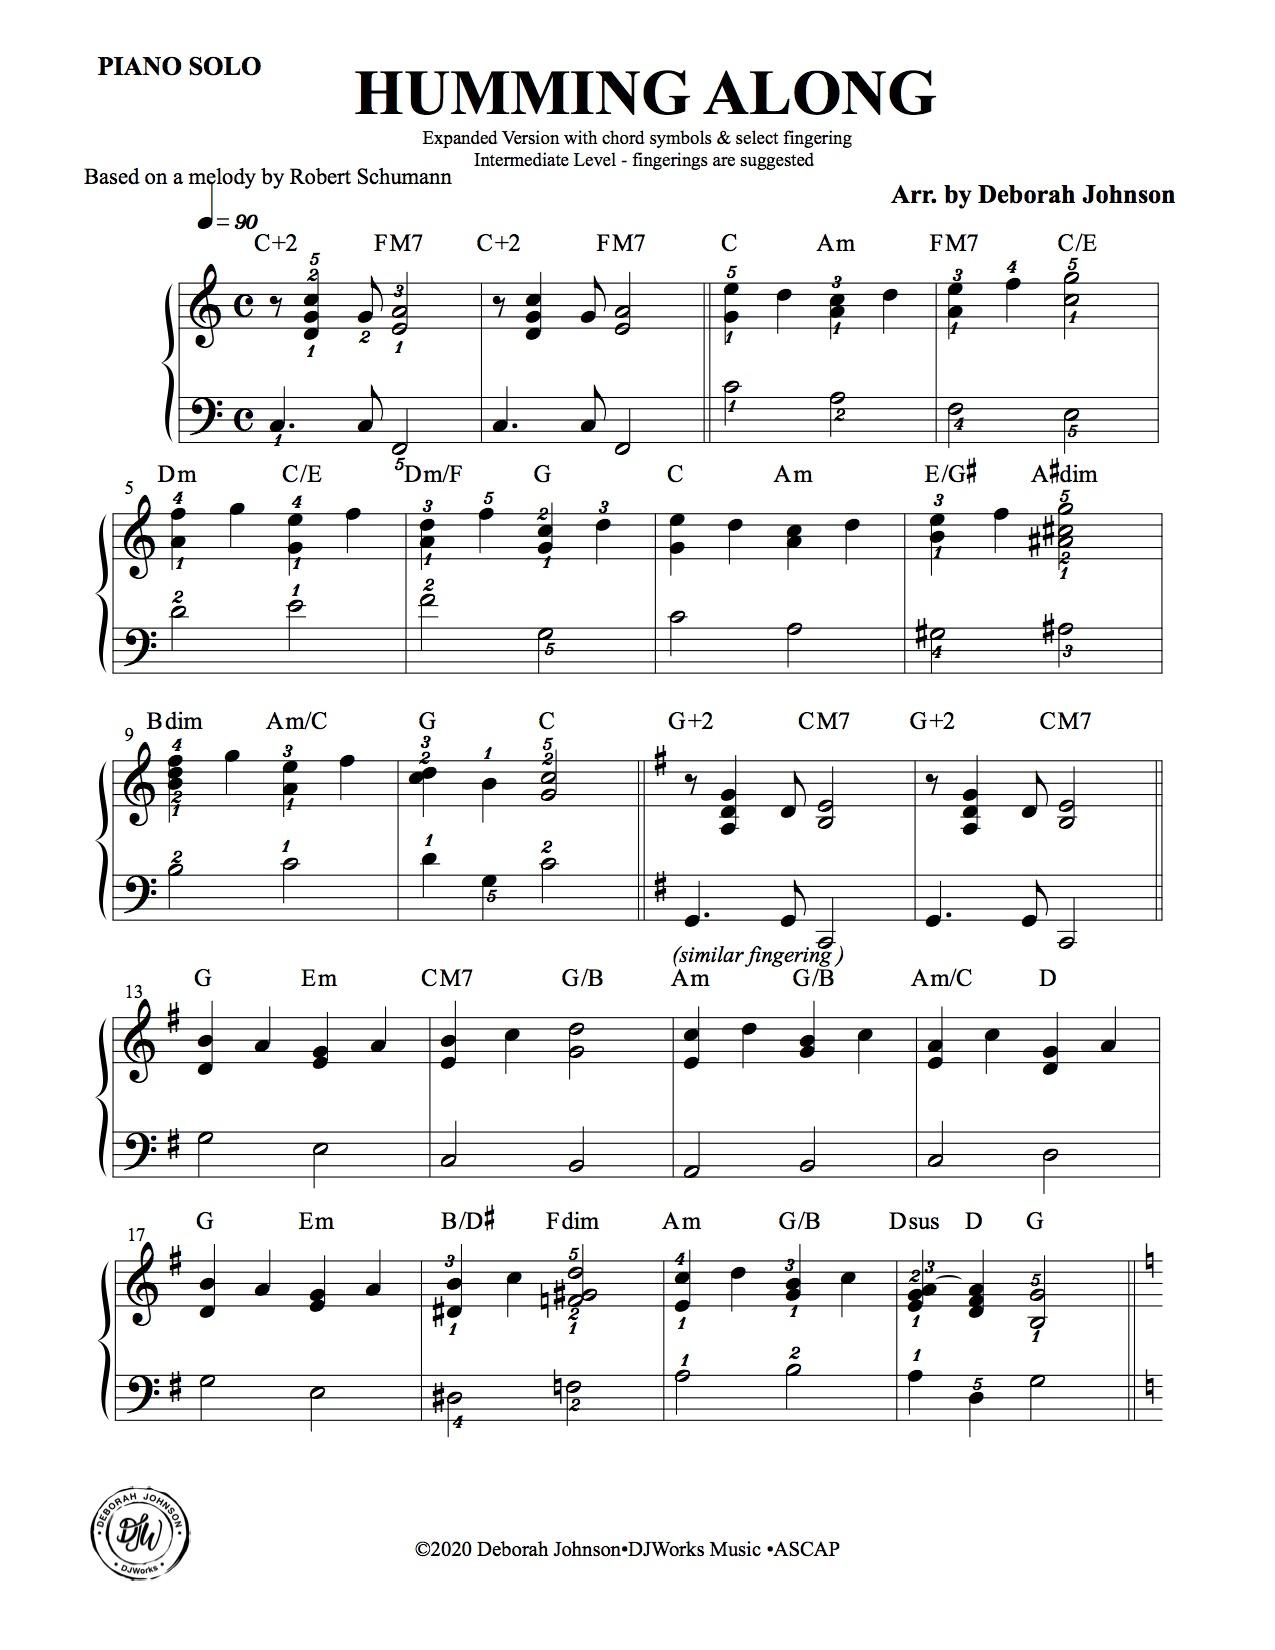 Humming Along-Deborah Johnson Piano Music